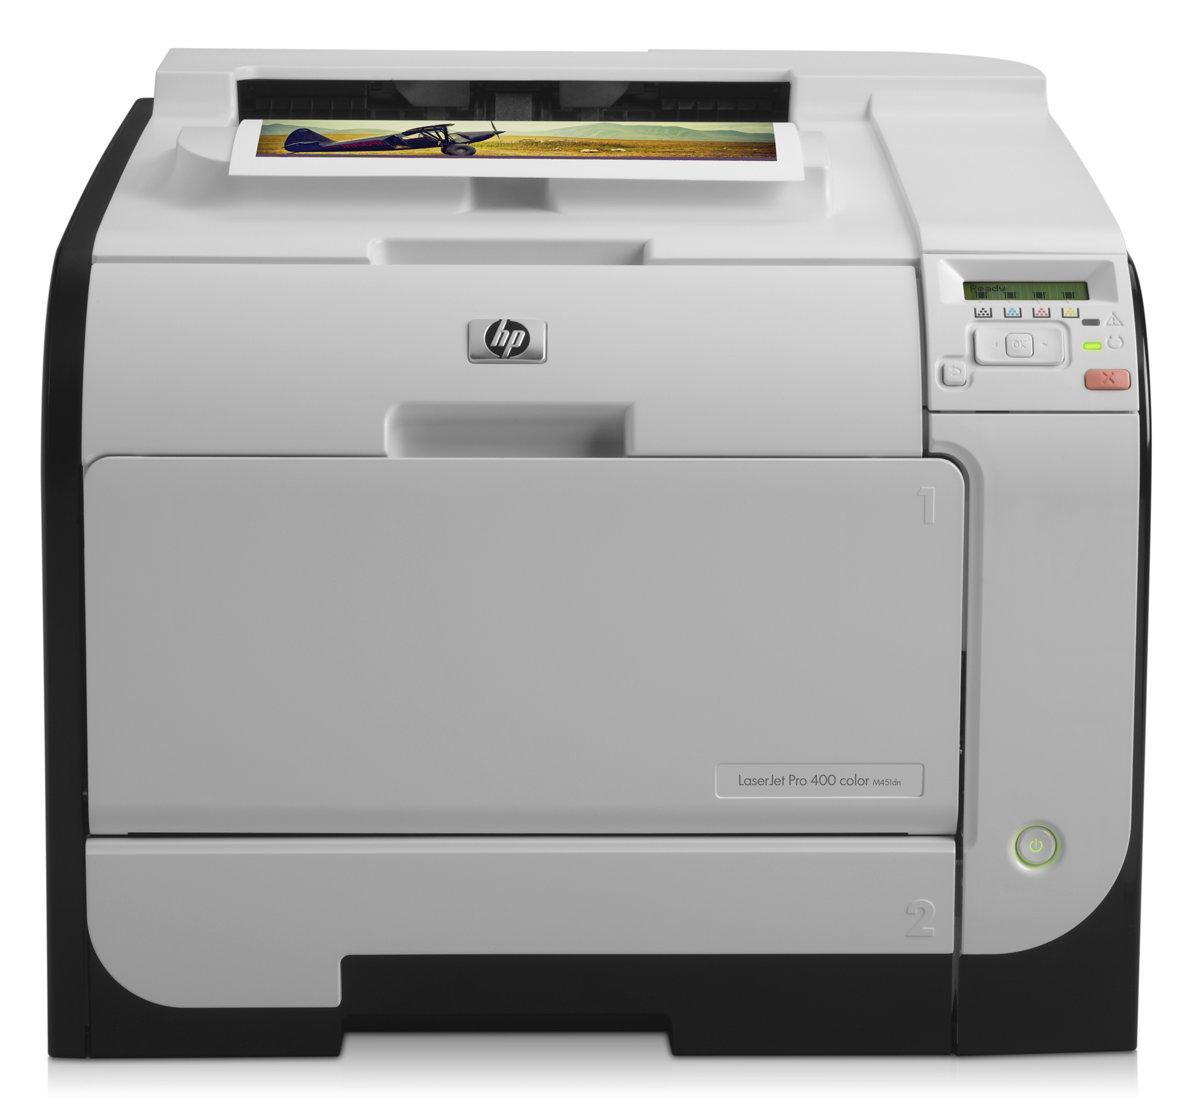 Color printing office depot - Hp Laserjet Pro 400 Color M451dn Color Printer By Office Depot Officemax